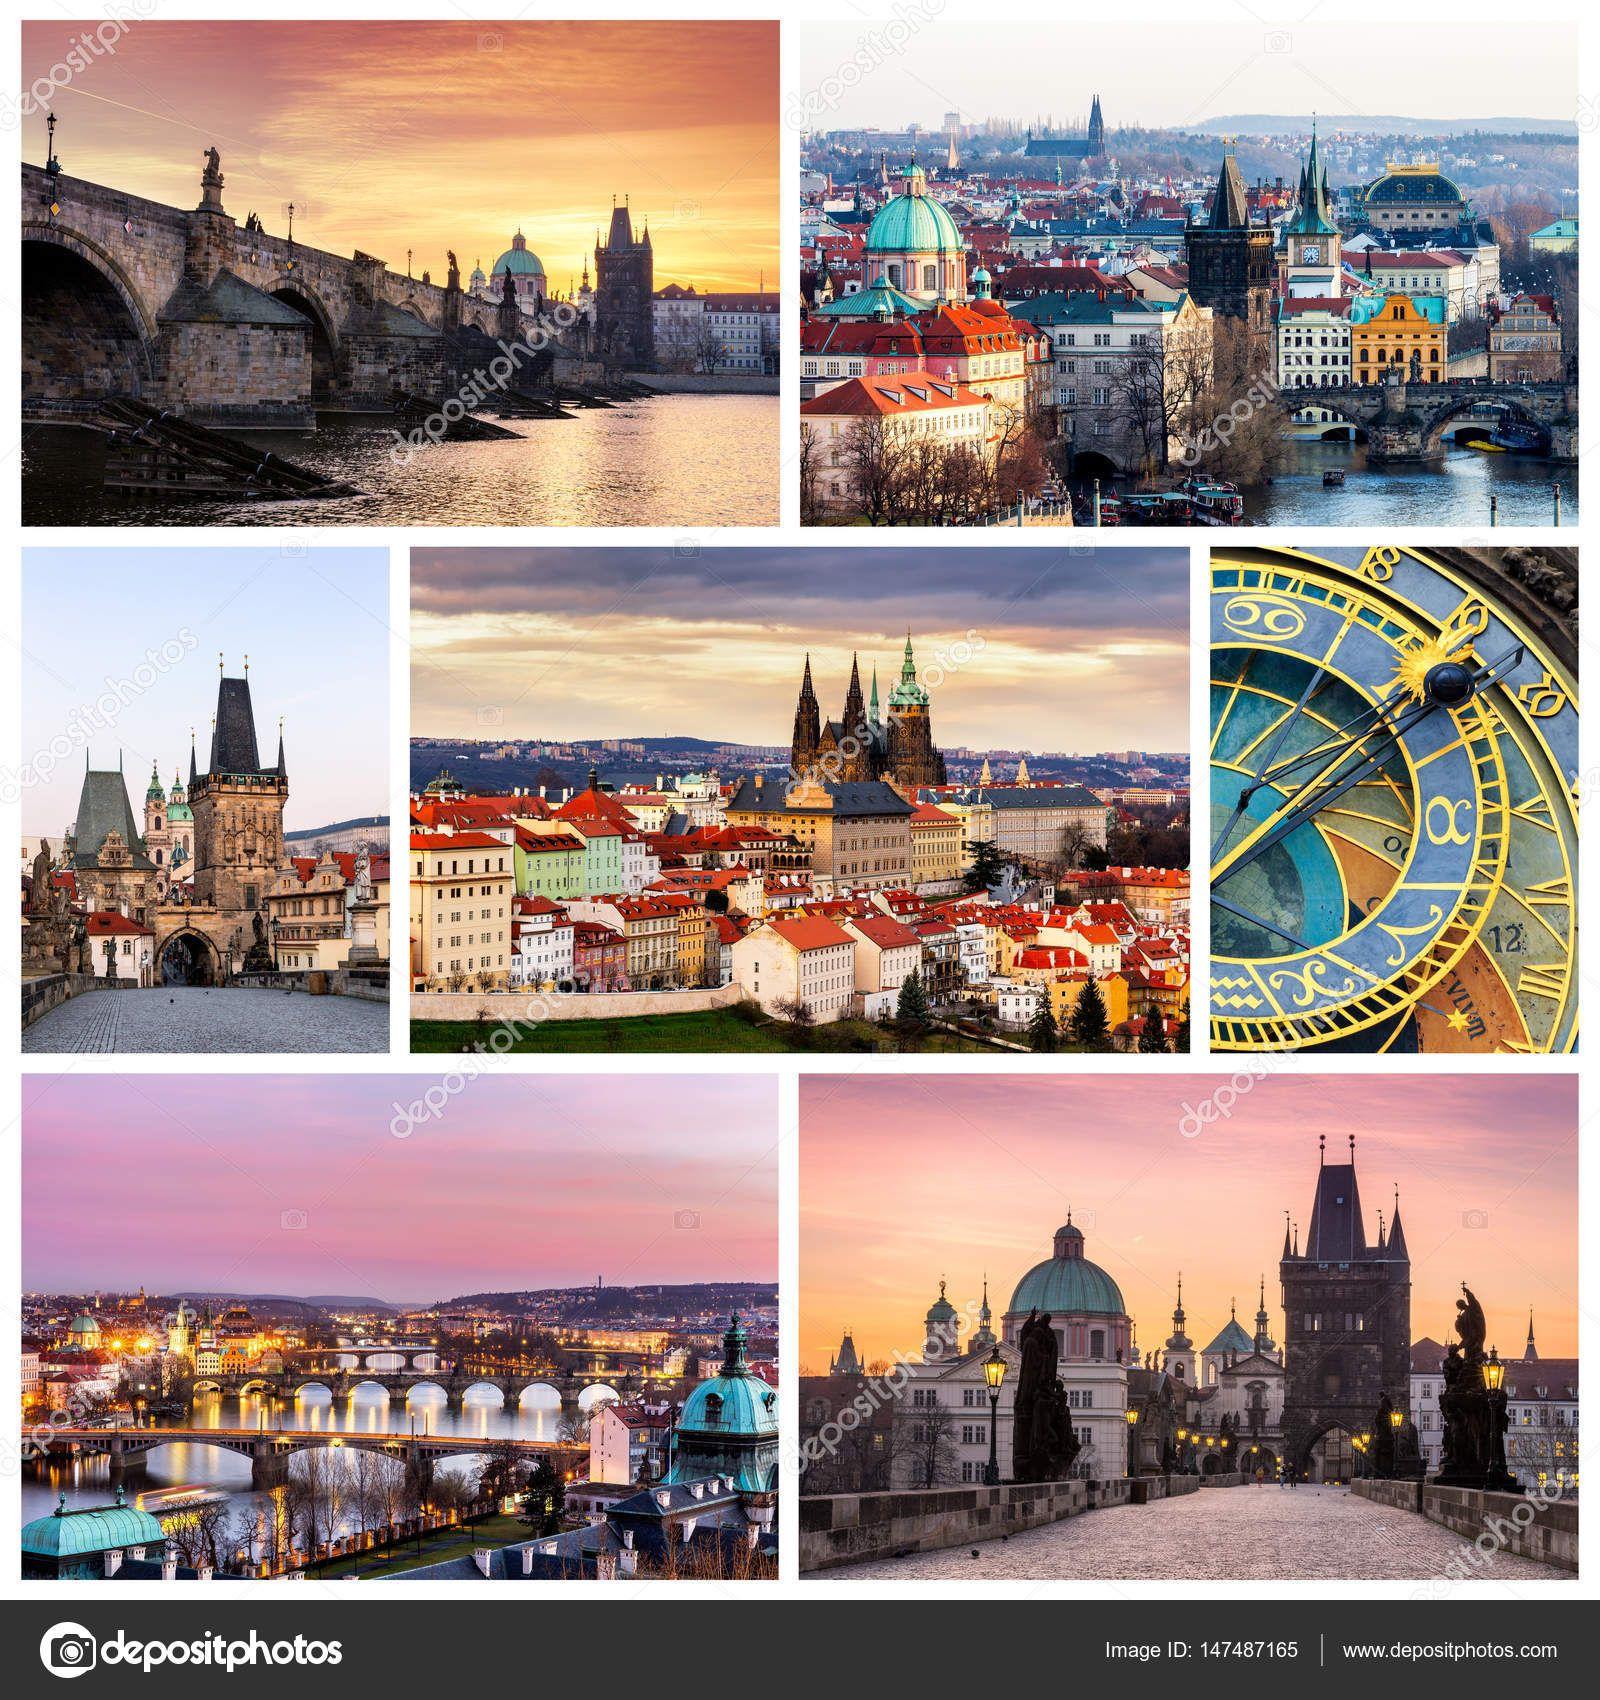 Stahnout Fotograficke Kolaze Z Prahy Ceska Republika Kolaz